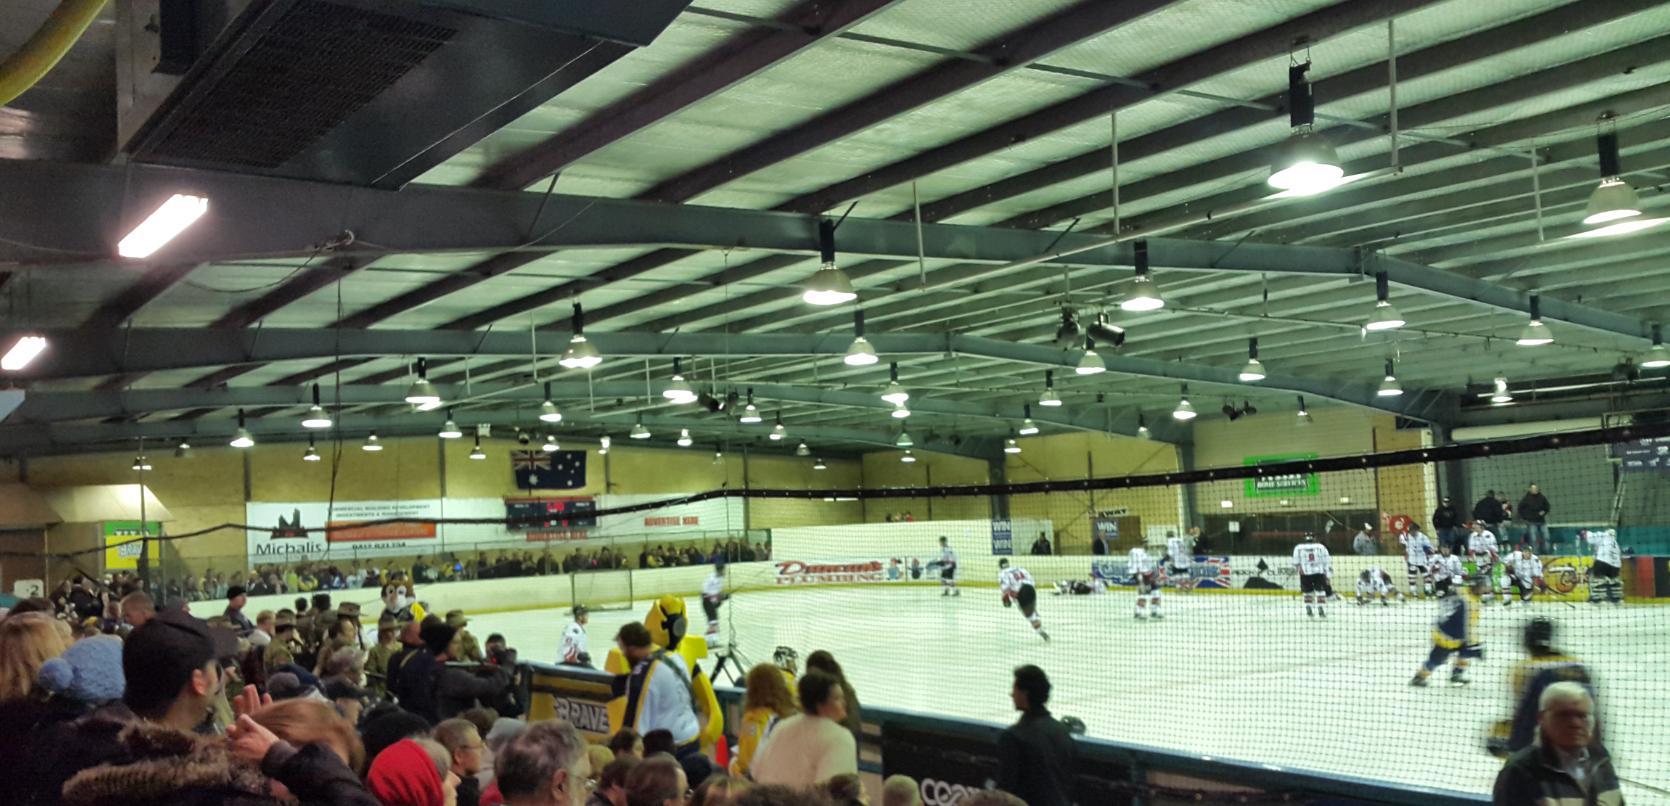 Roller skating rink canberra - Phillip Ice Skating Centre Ice Rink Png